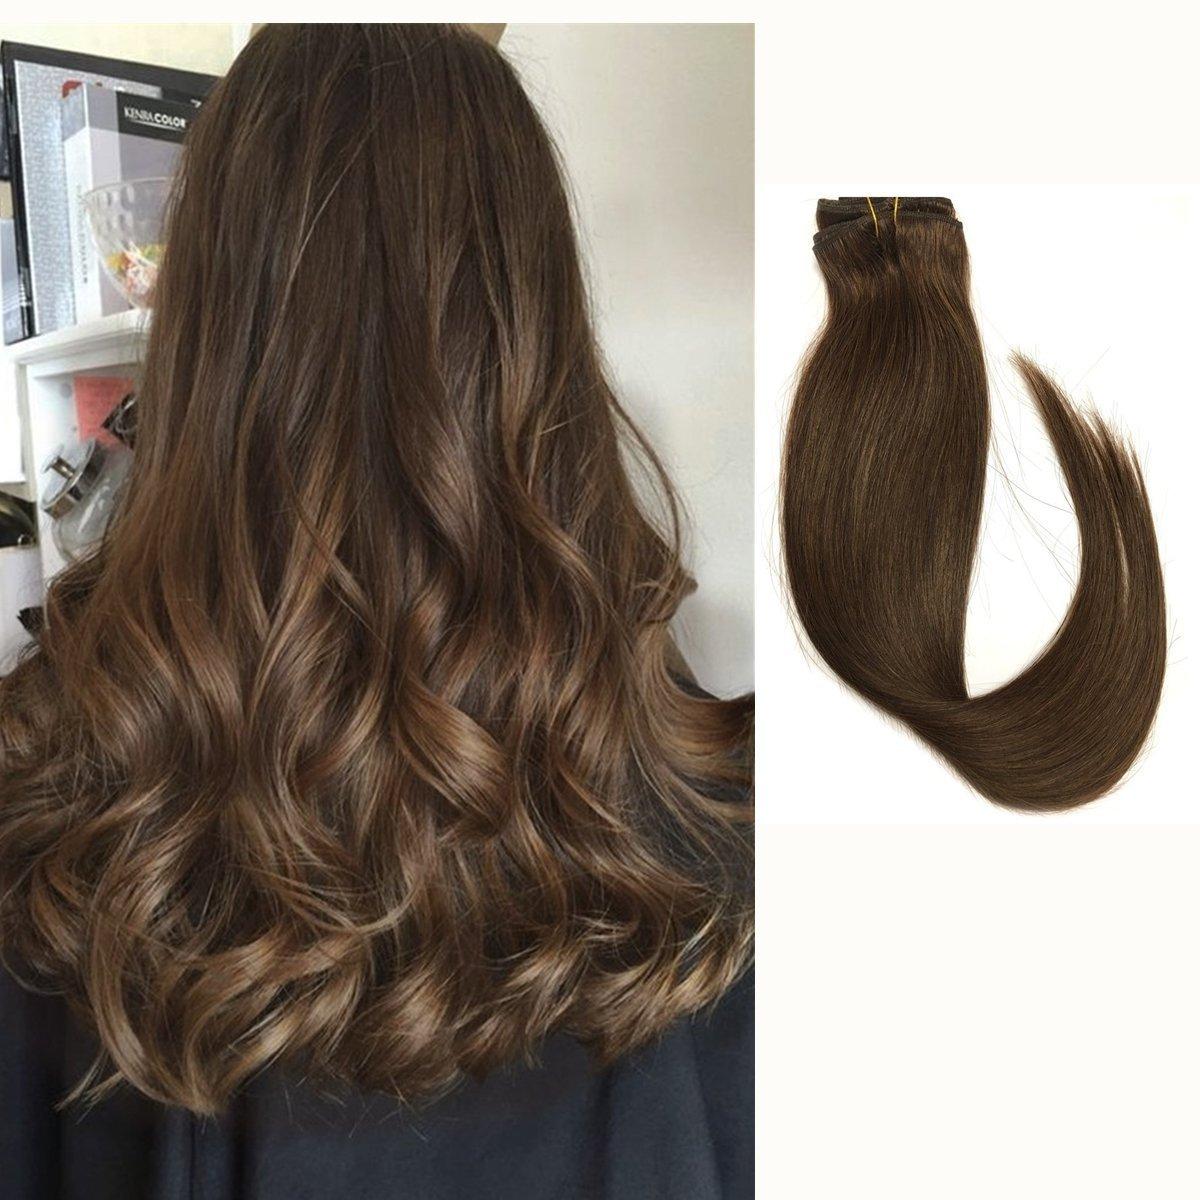 Amazon Clip In Human Hair Extensions Medium Brown 427